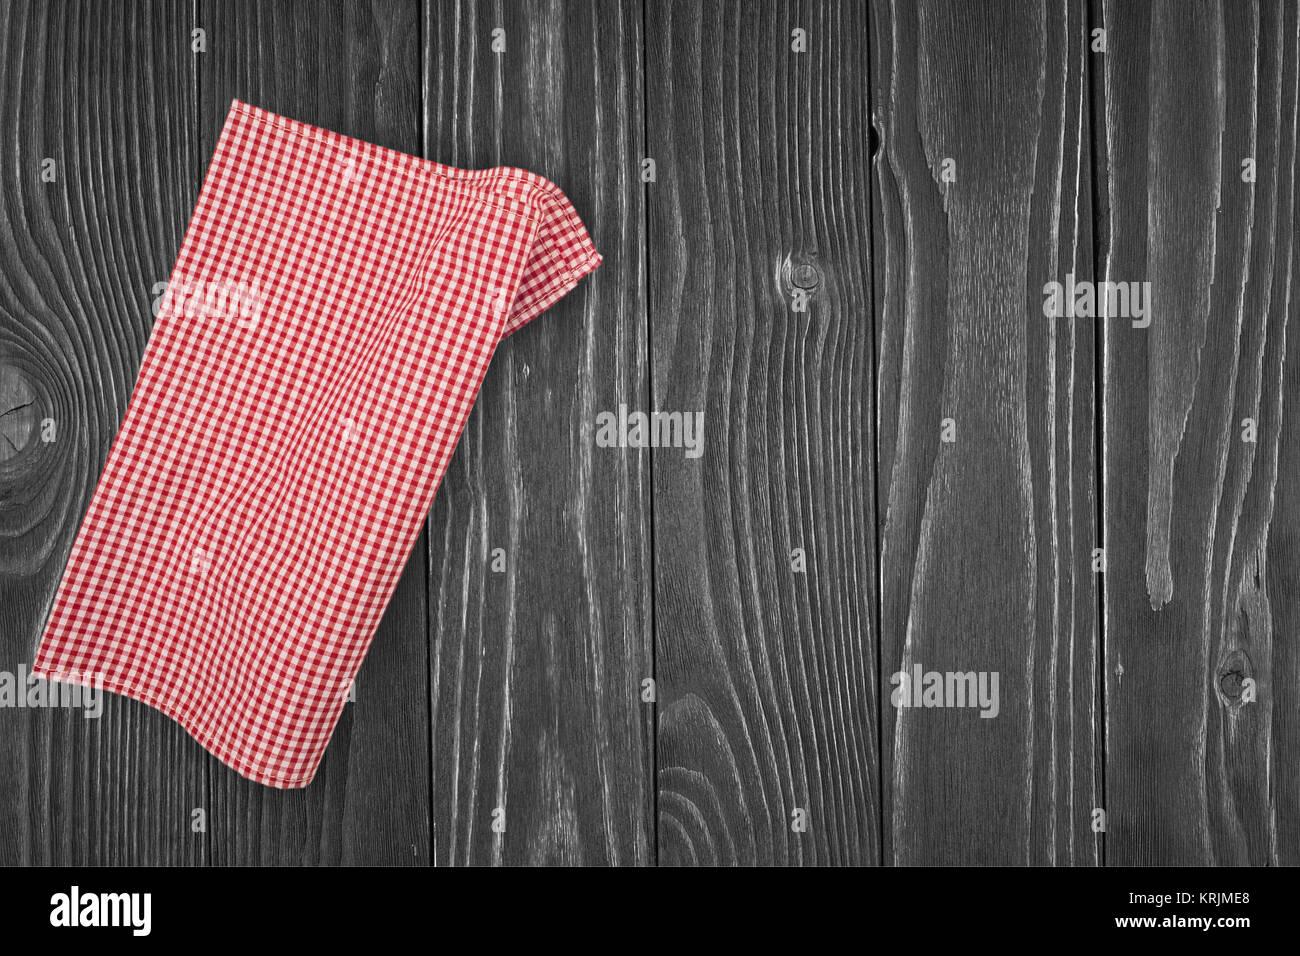 cloth napkin on wooden background - Stock Image